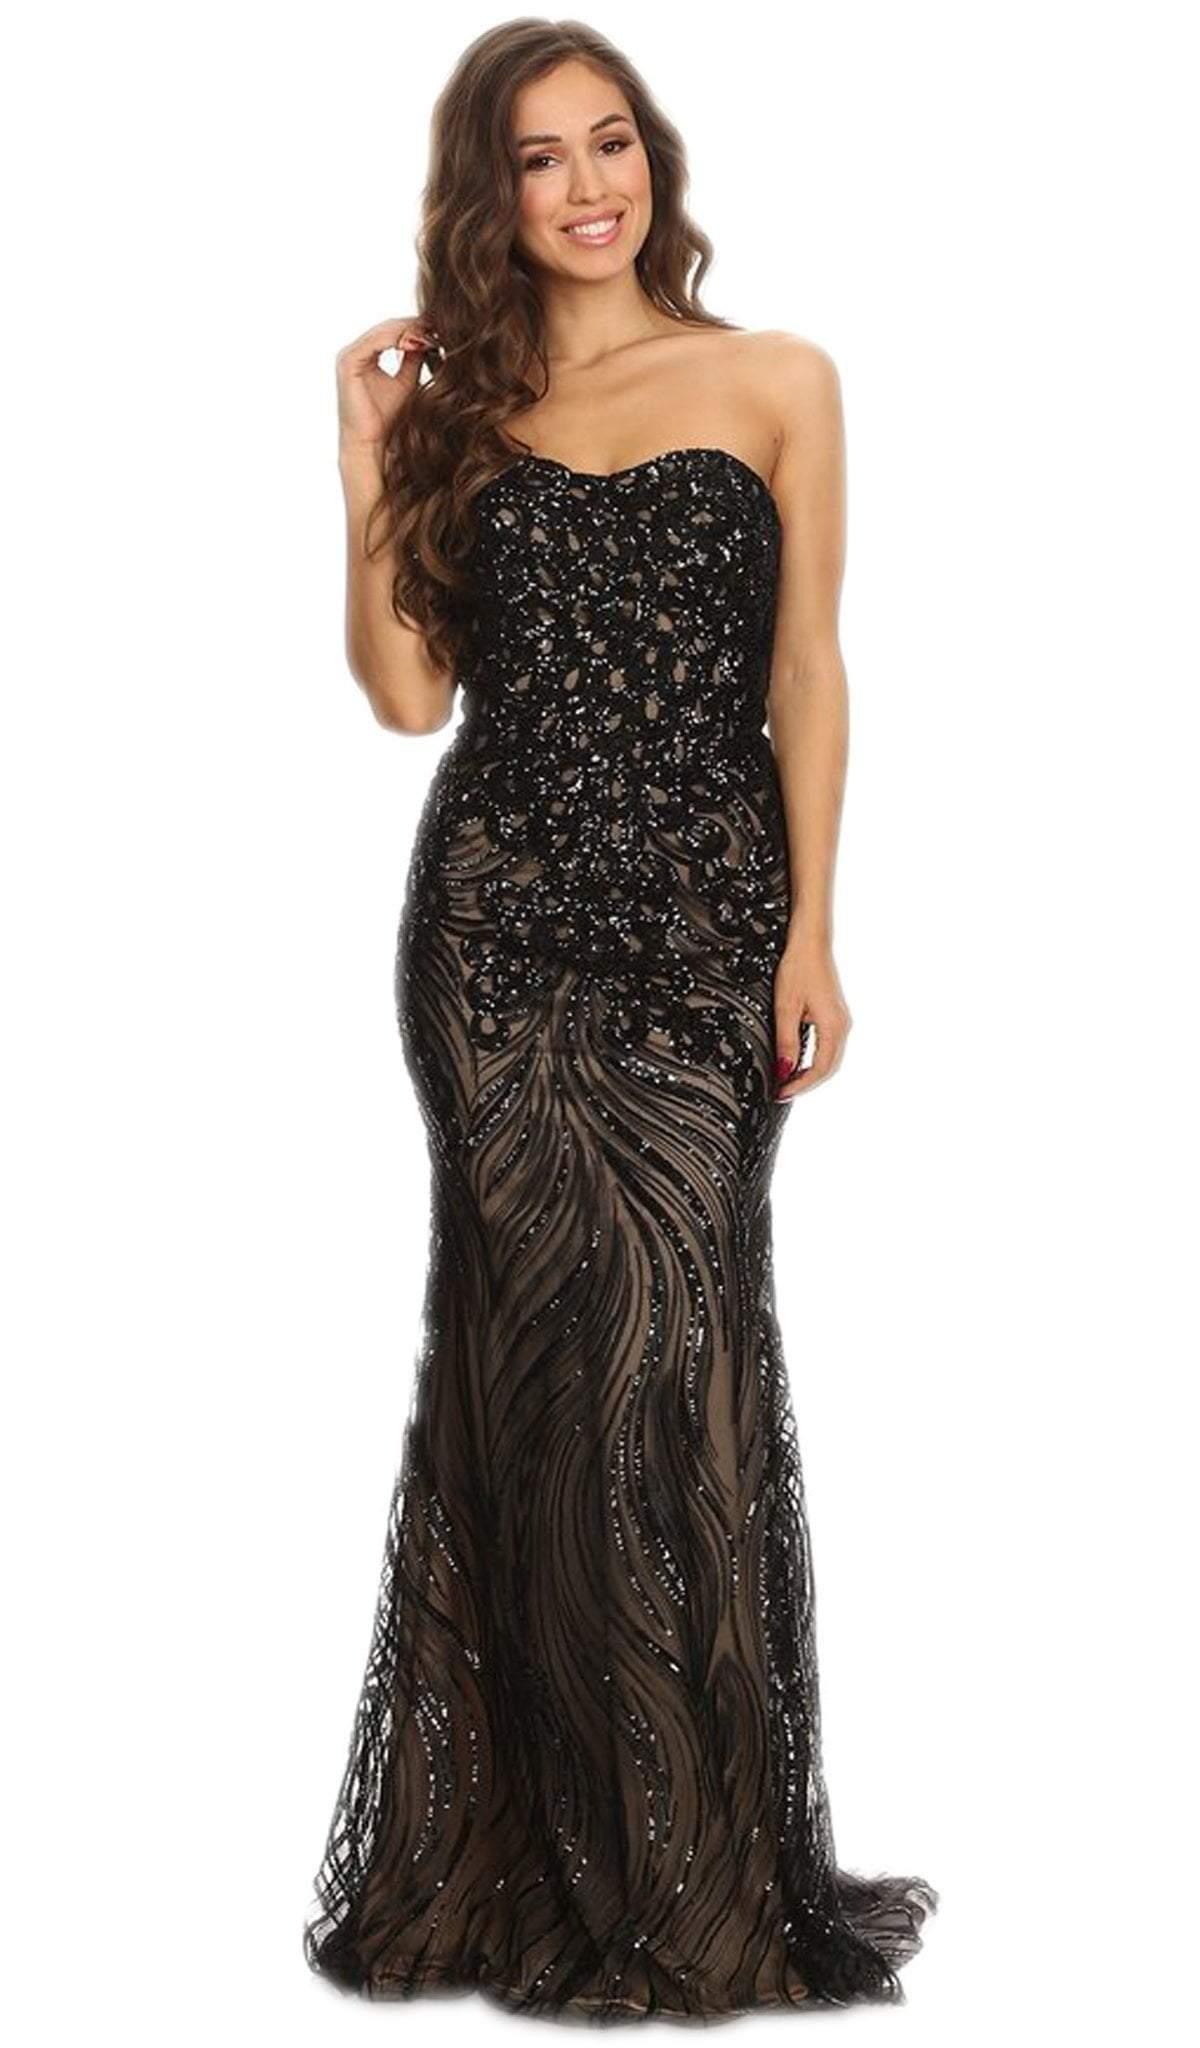 Eureka Fashion - Strapless Sequined Semi-Sweetheart Sheath Evening Dress